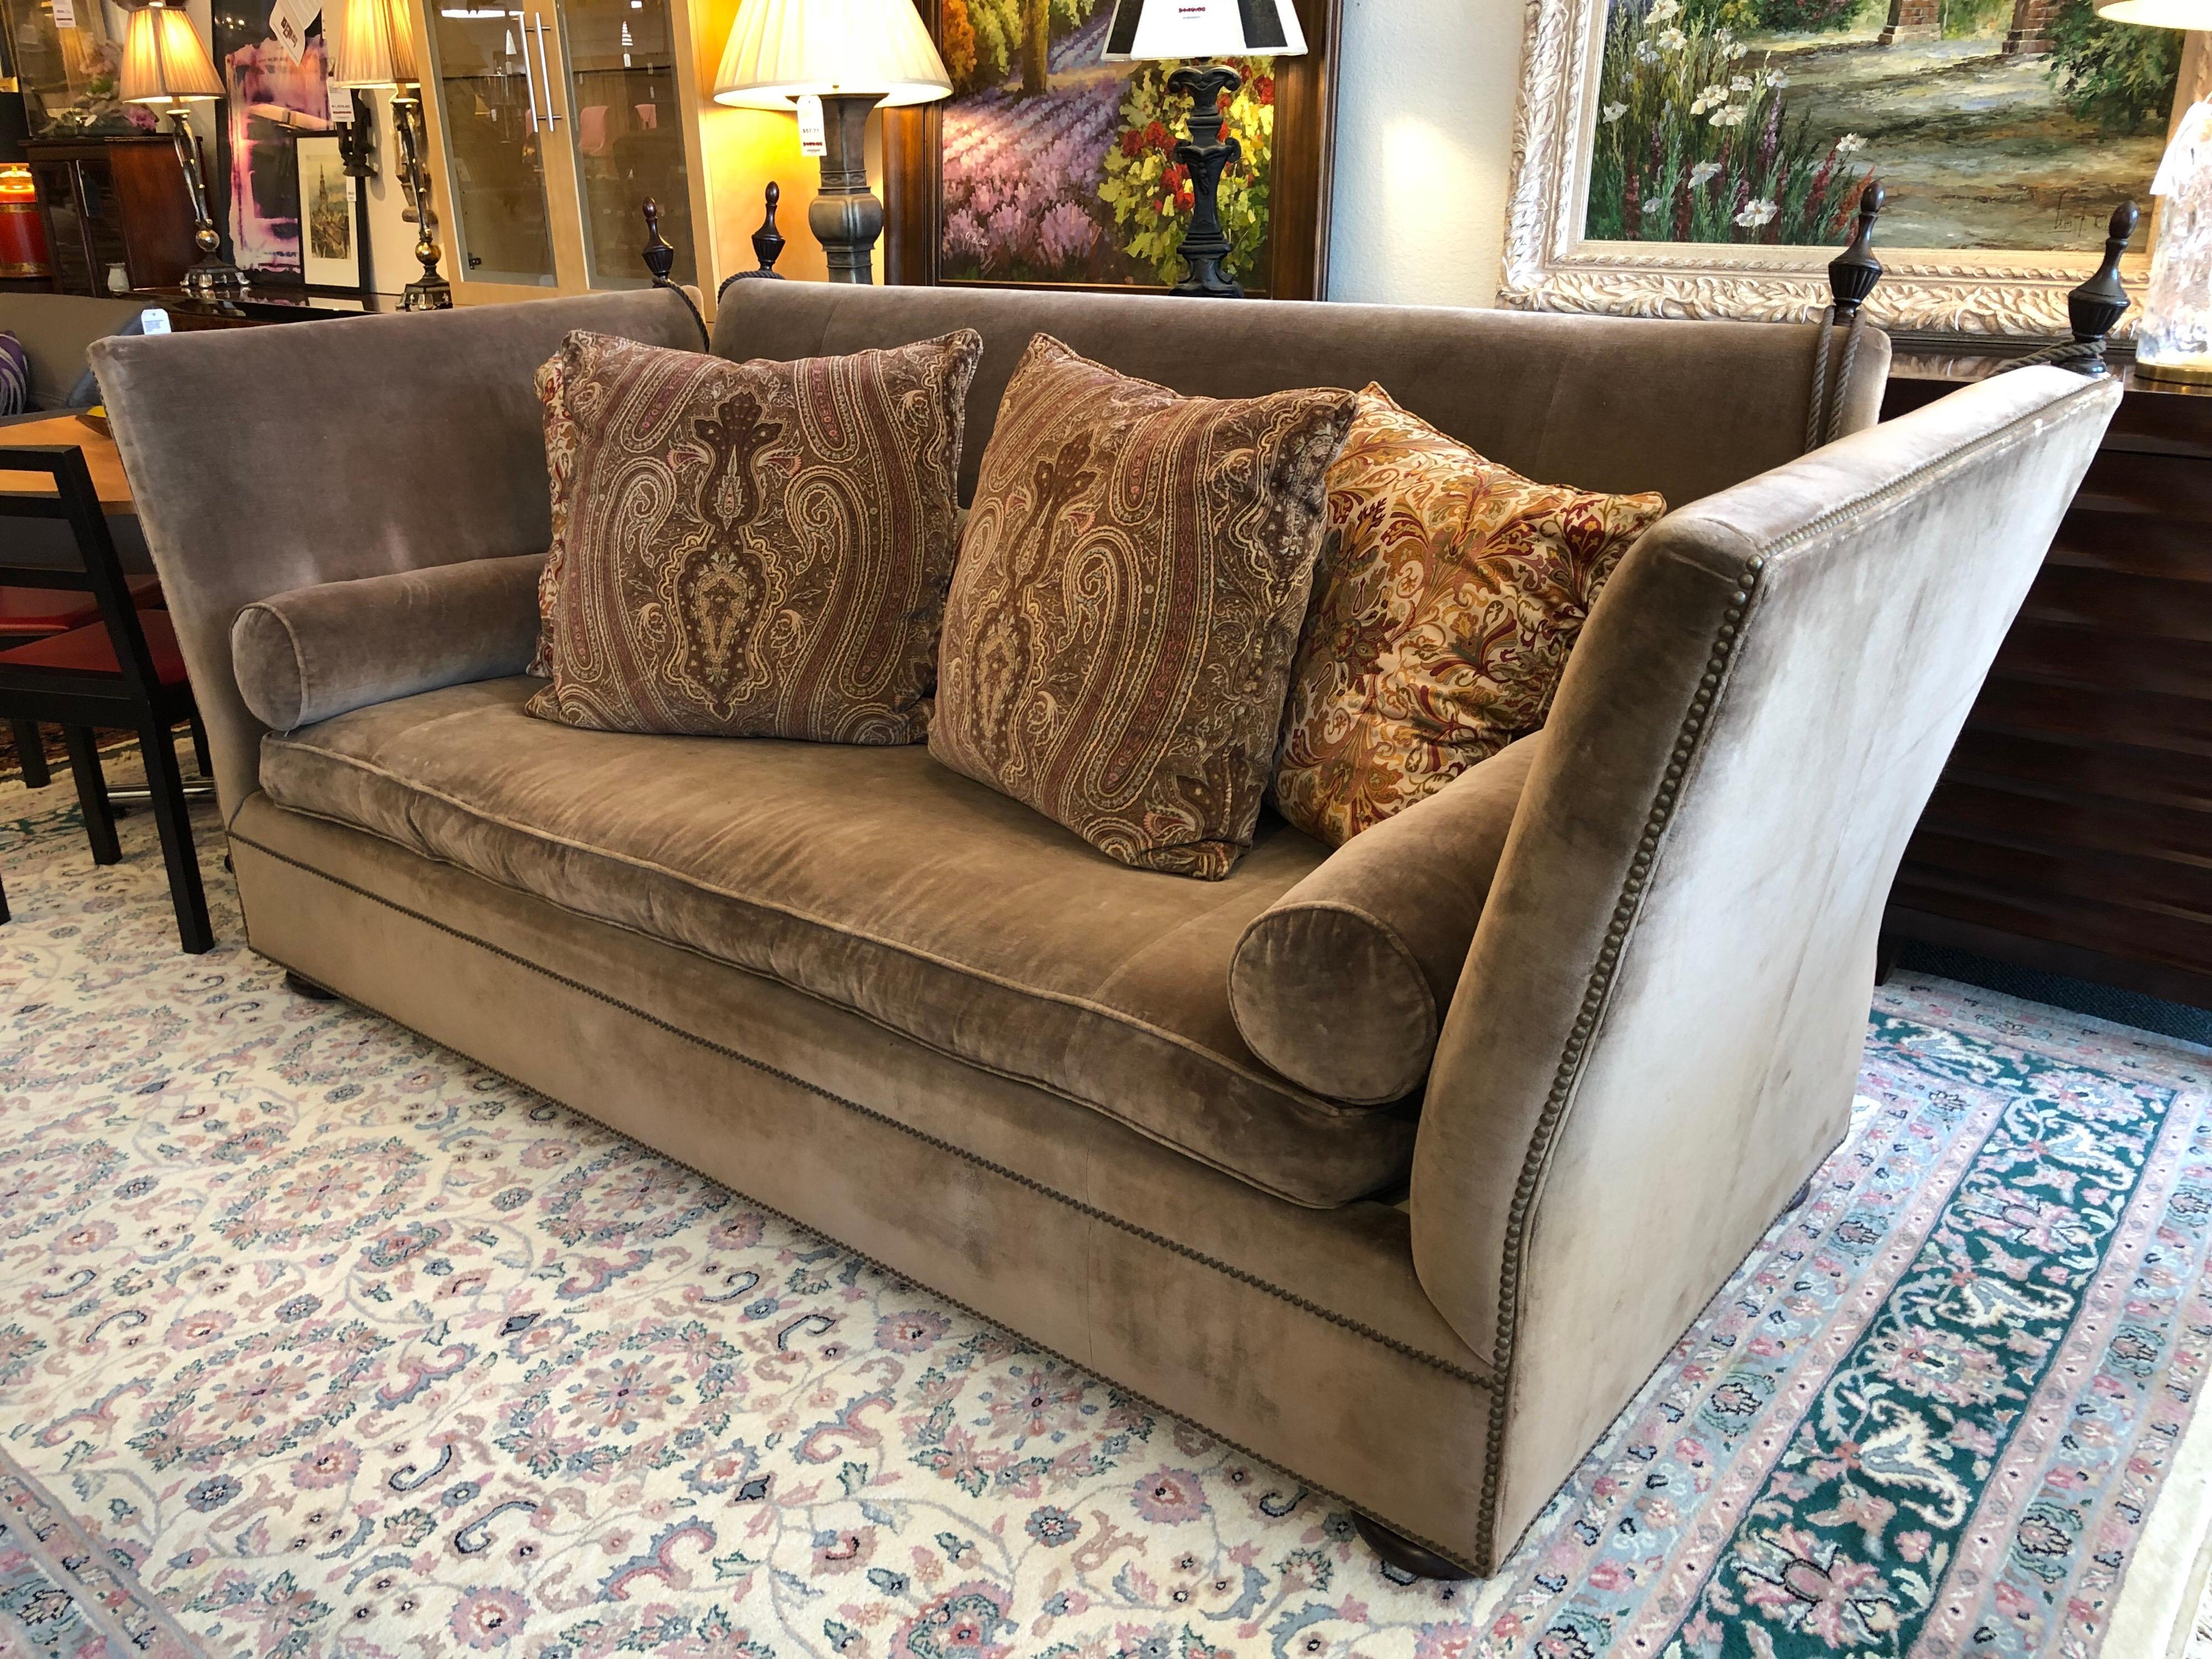 fairmont sofa laura ashley modern gray velvet sectional henredon knole cambridge in mushroom for sale at 1stdibs a rolled side pillows nail head trim